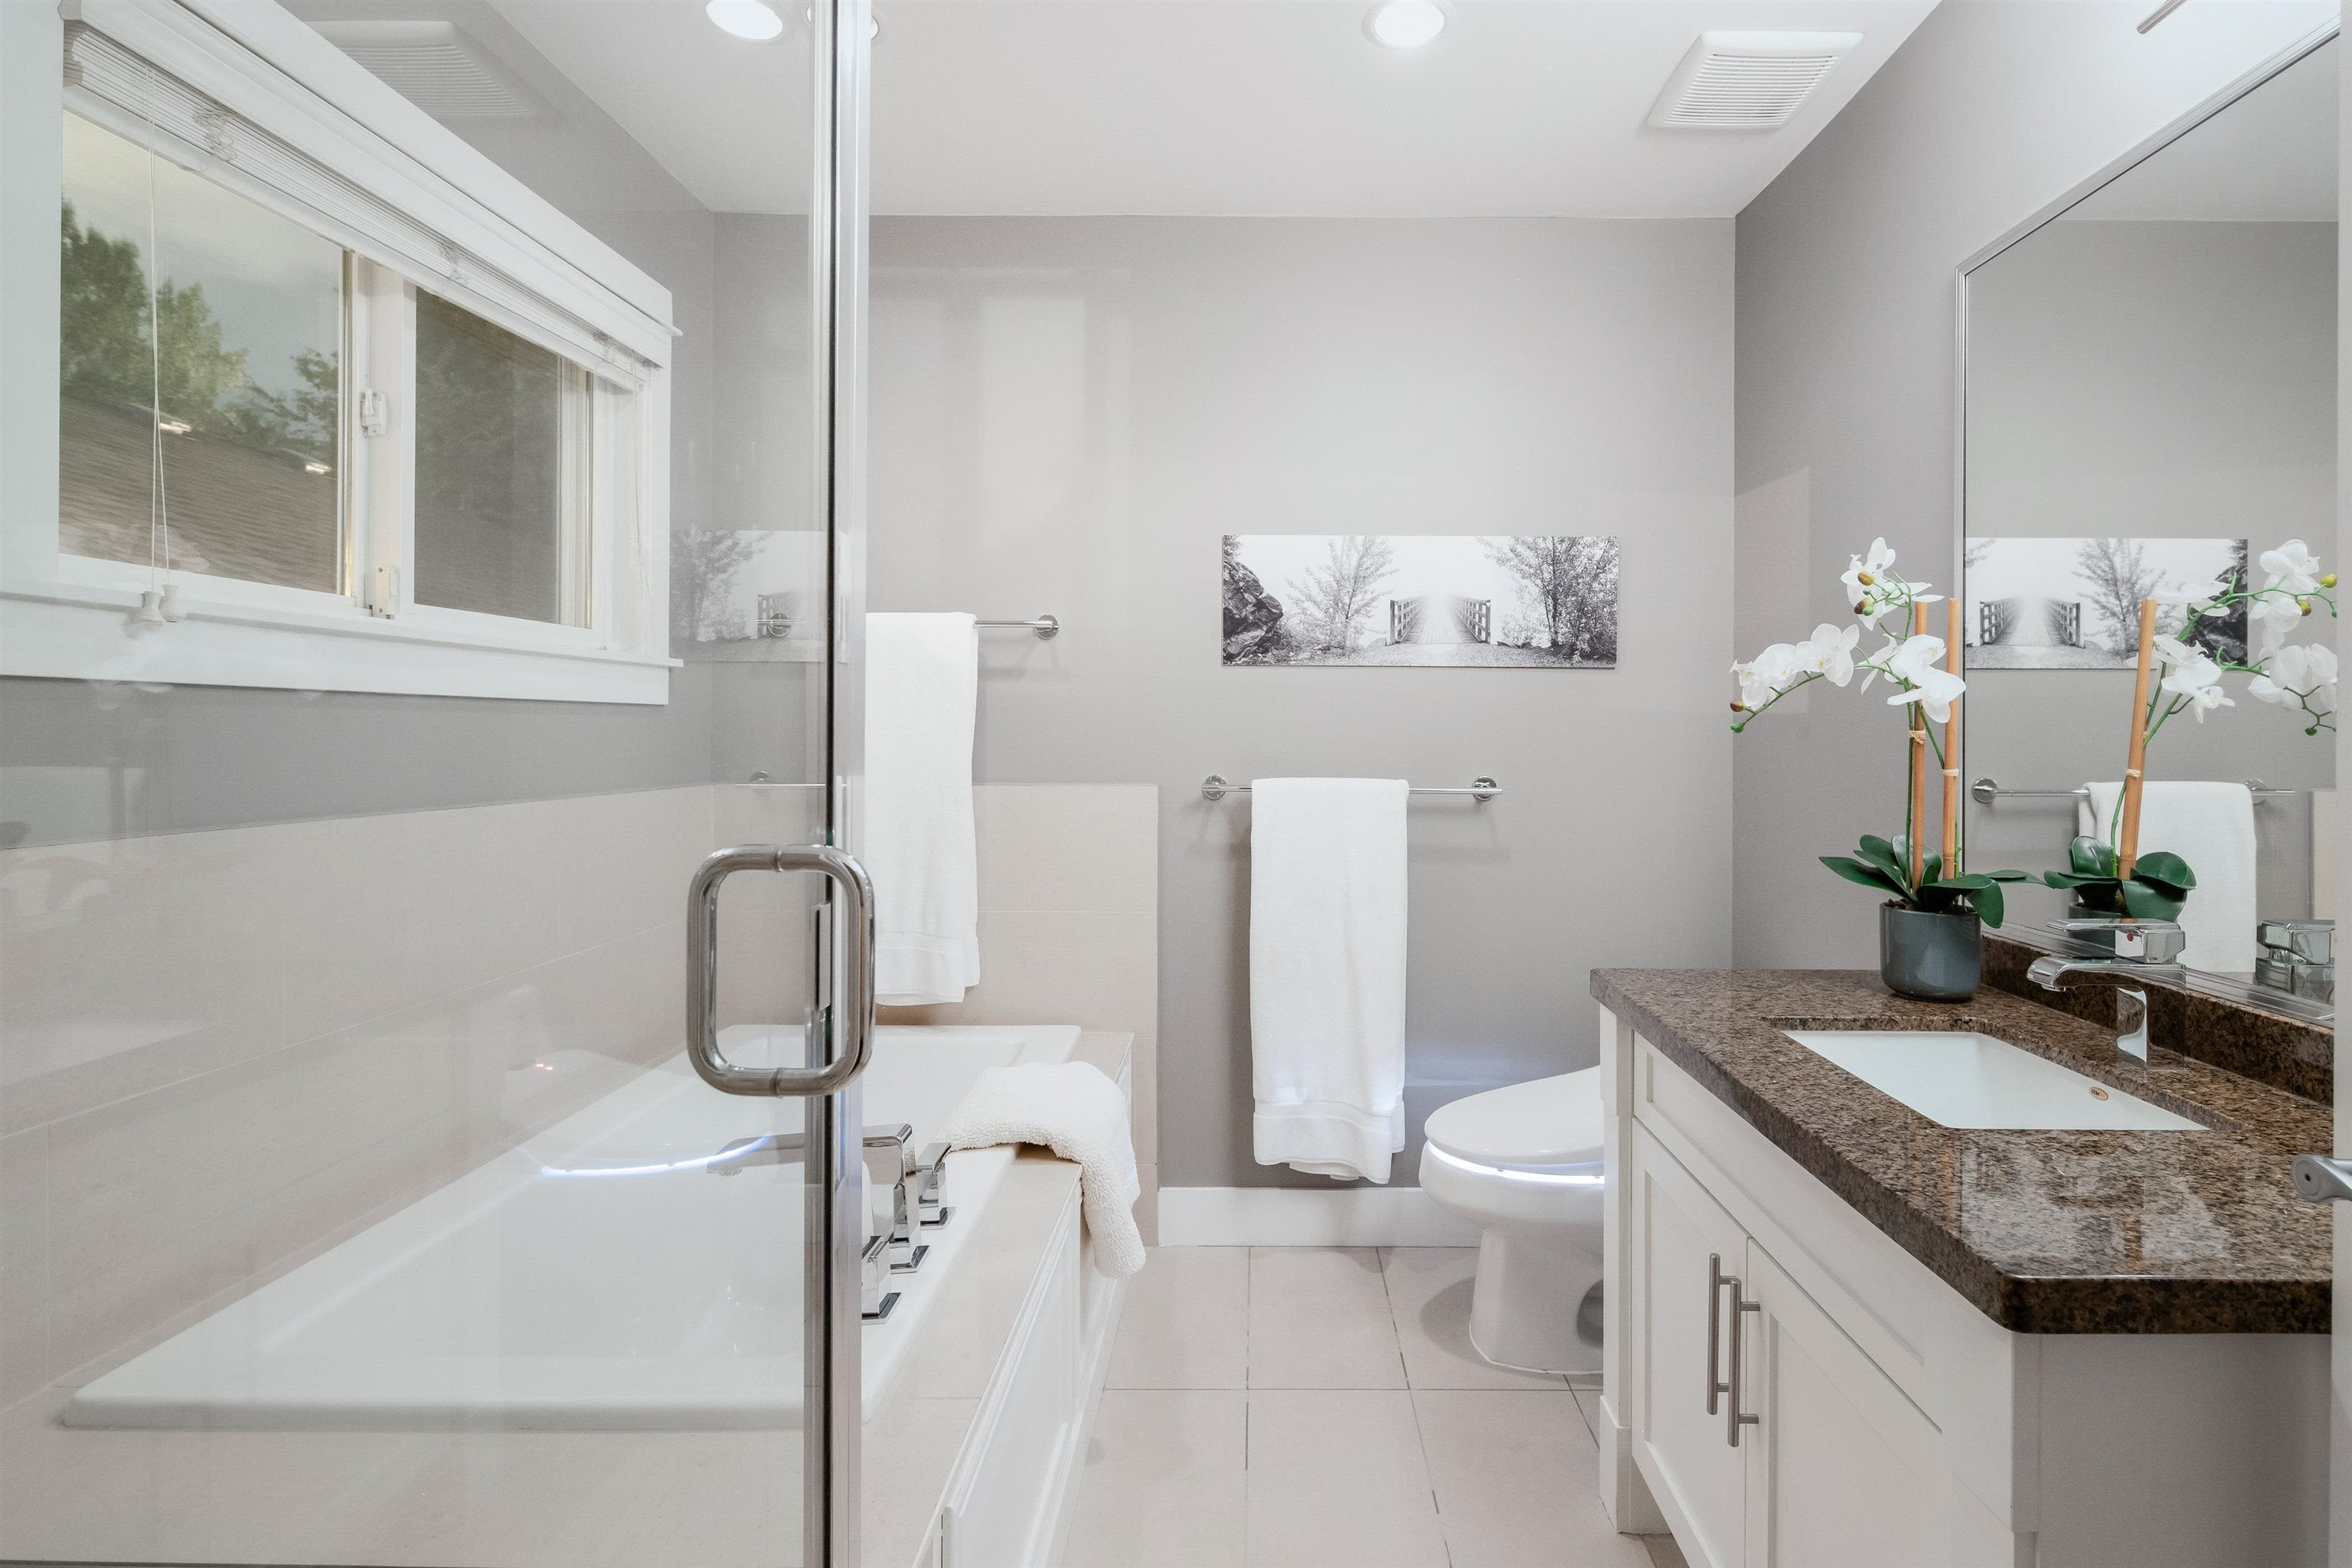 2258 WINDRIDGE DRIVE - Seymour NV House/Single Family for sale, 5 Bedrooms (R2617156) - #23